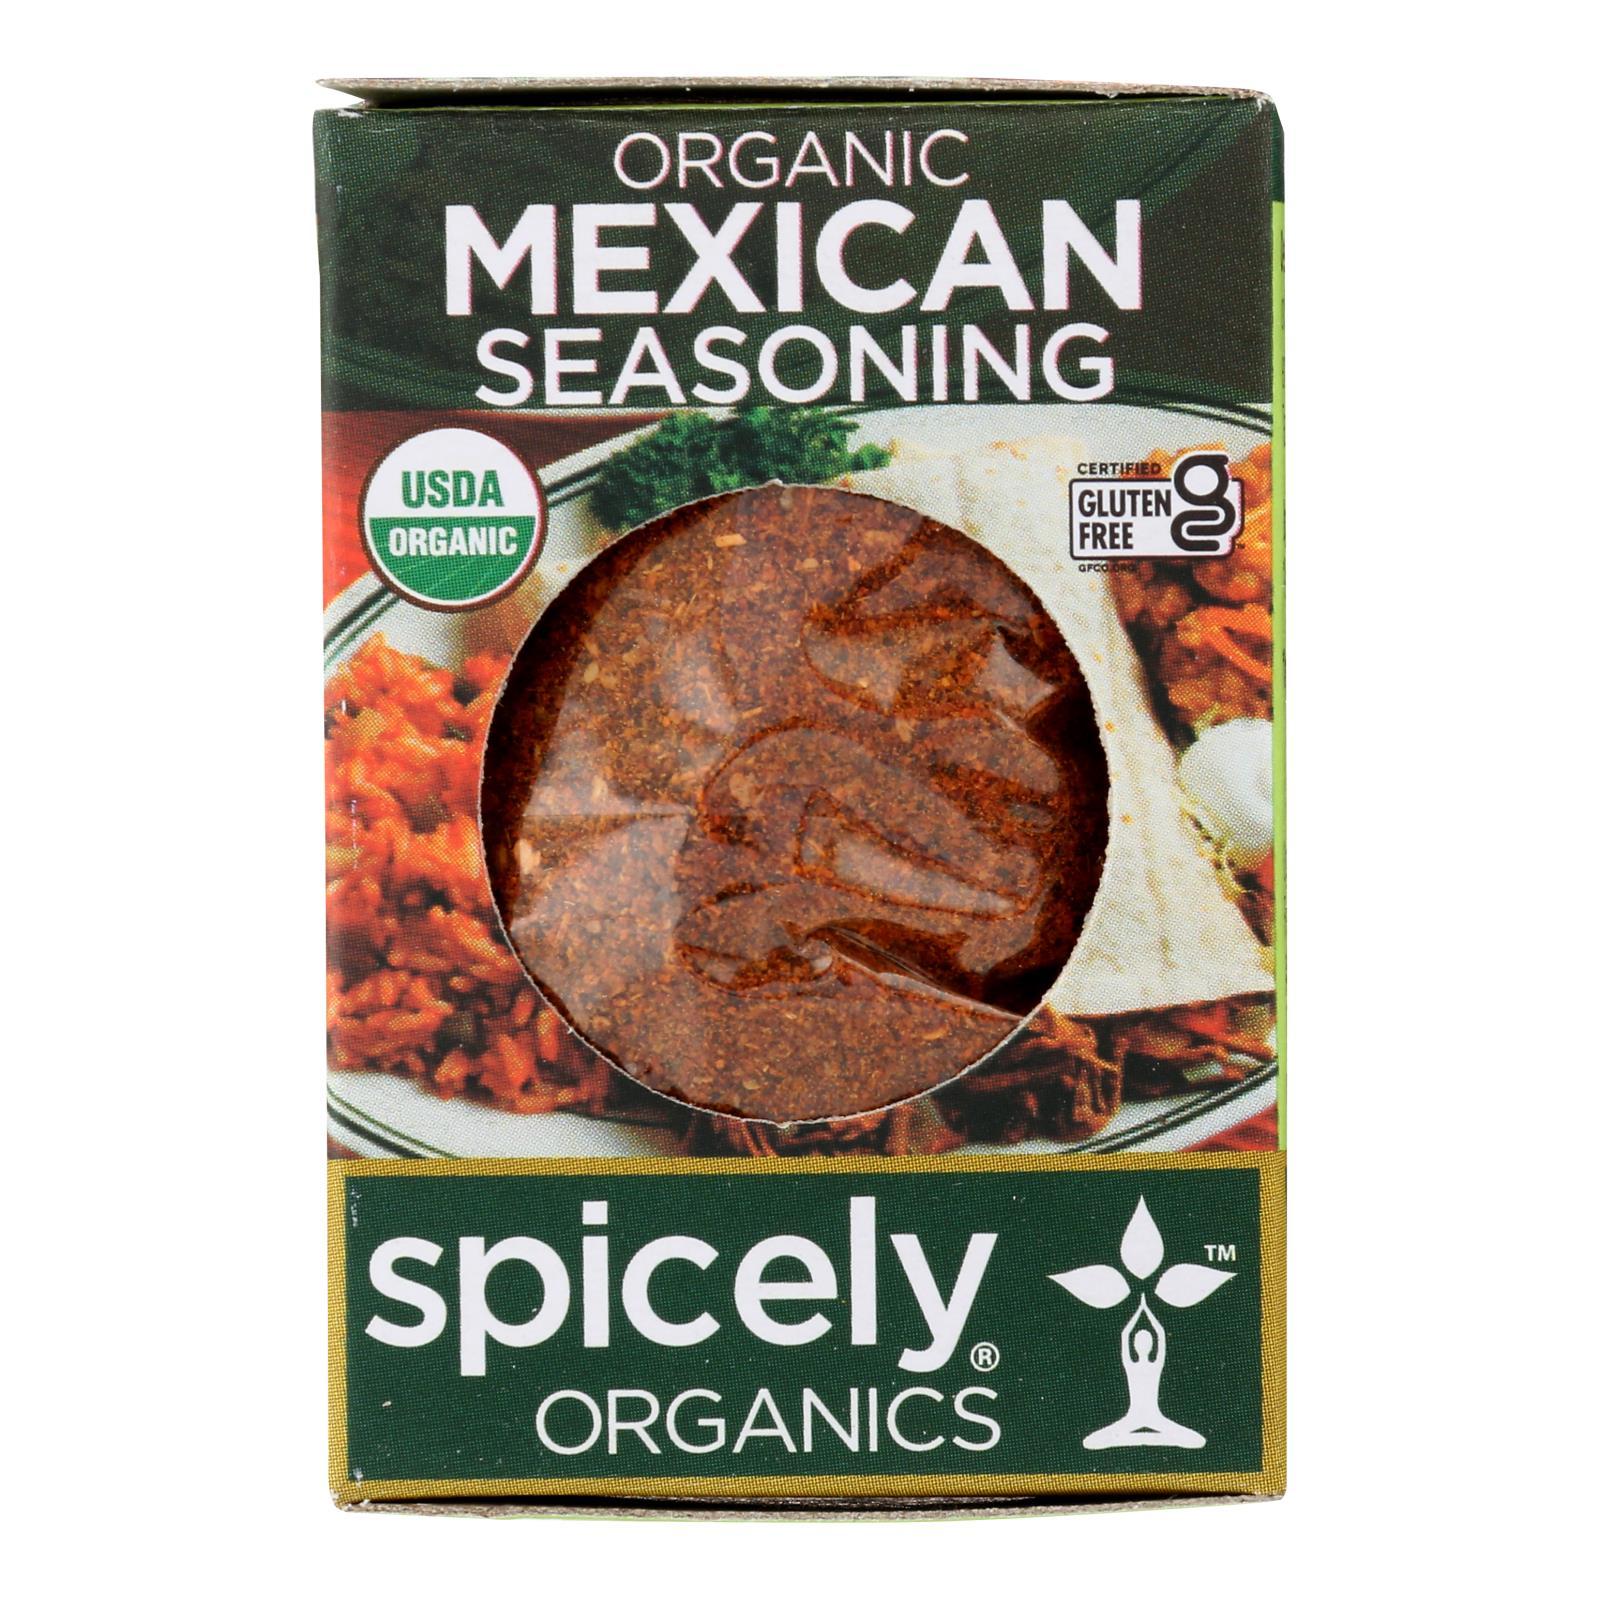 Spicely Organics - Organic Mexican Seasoning - Case of 6 - 0.5 oz.